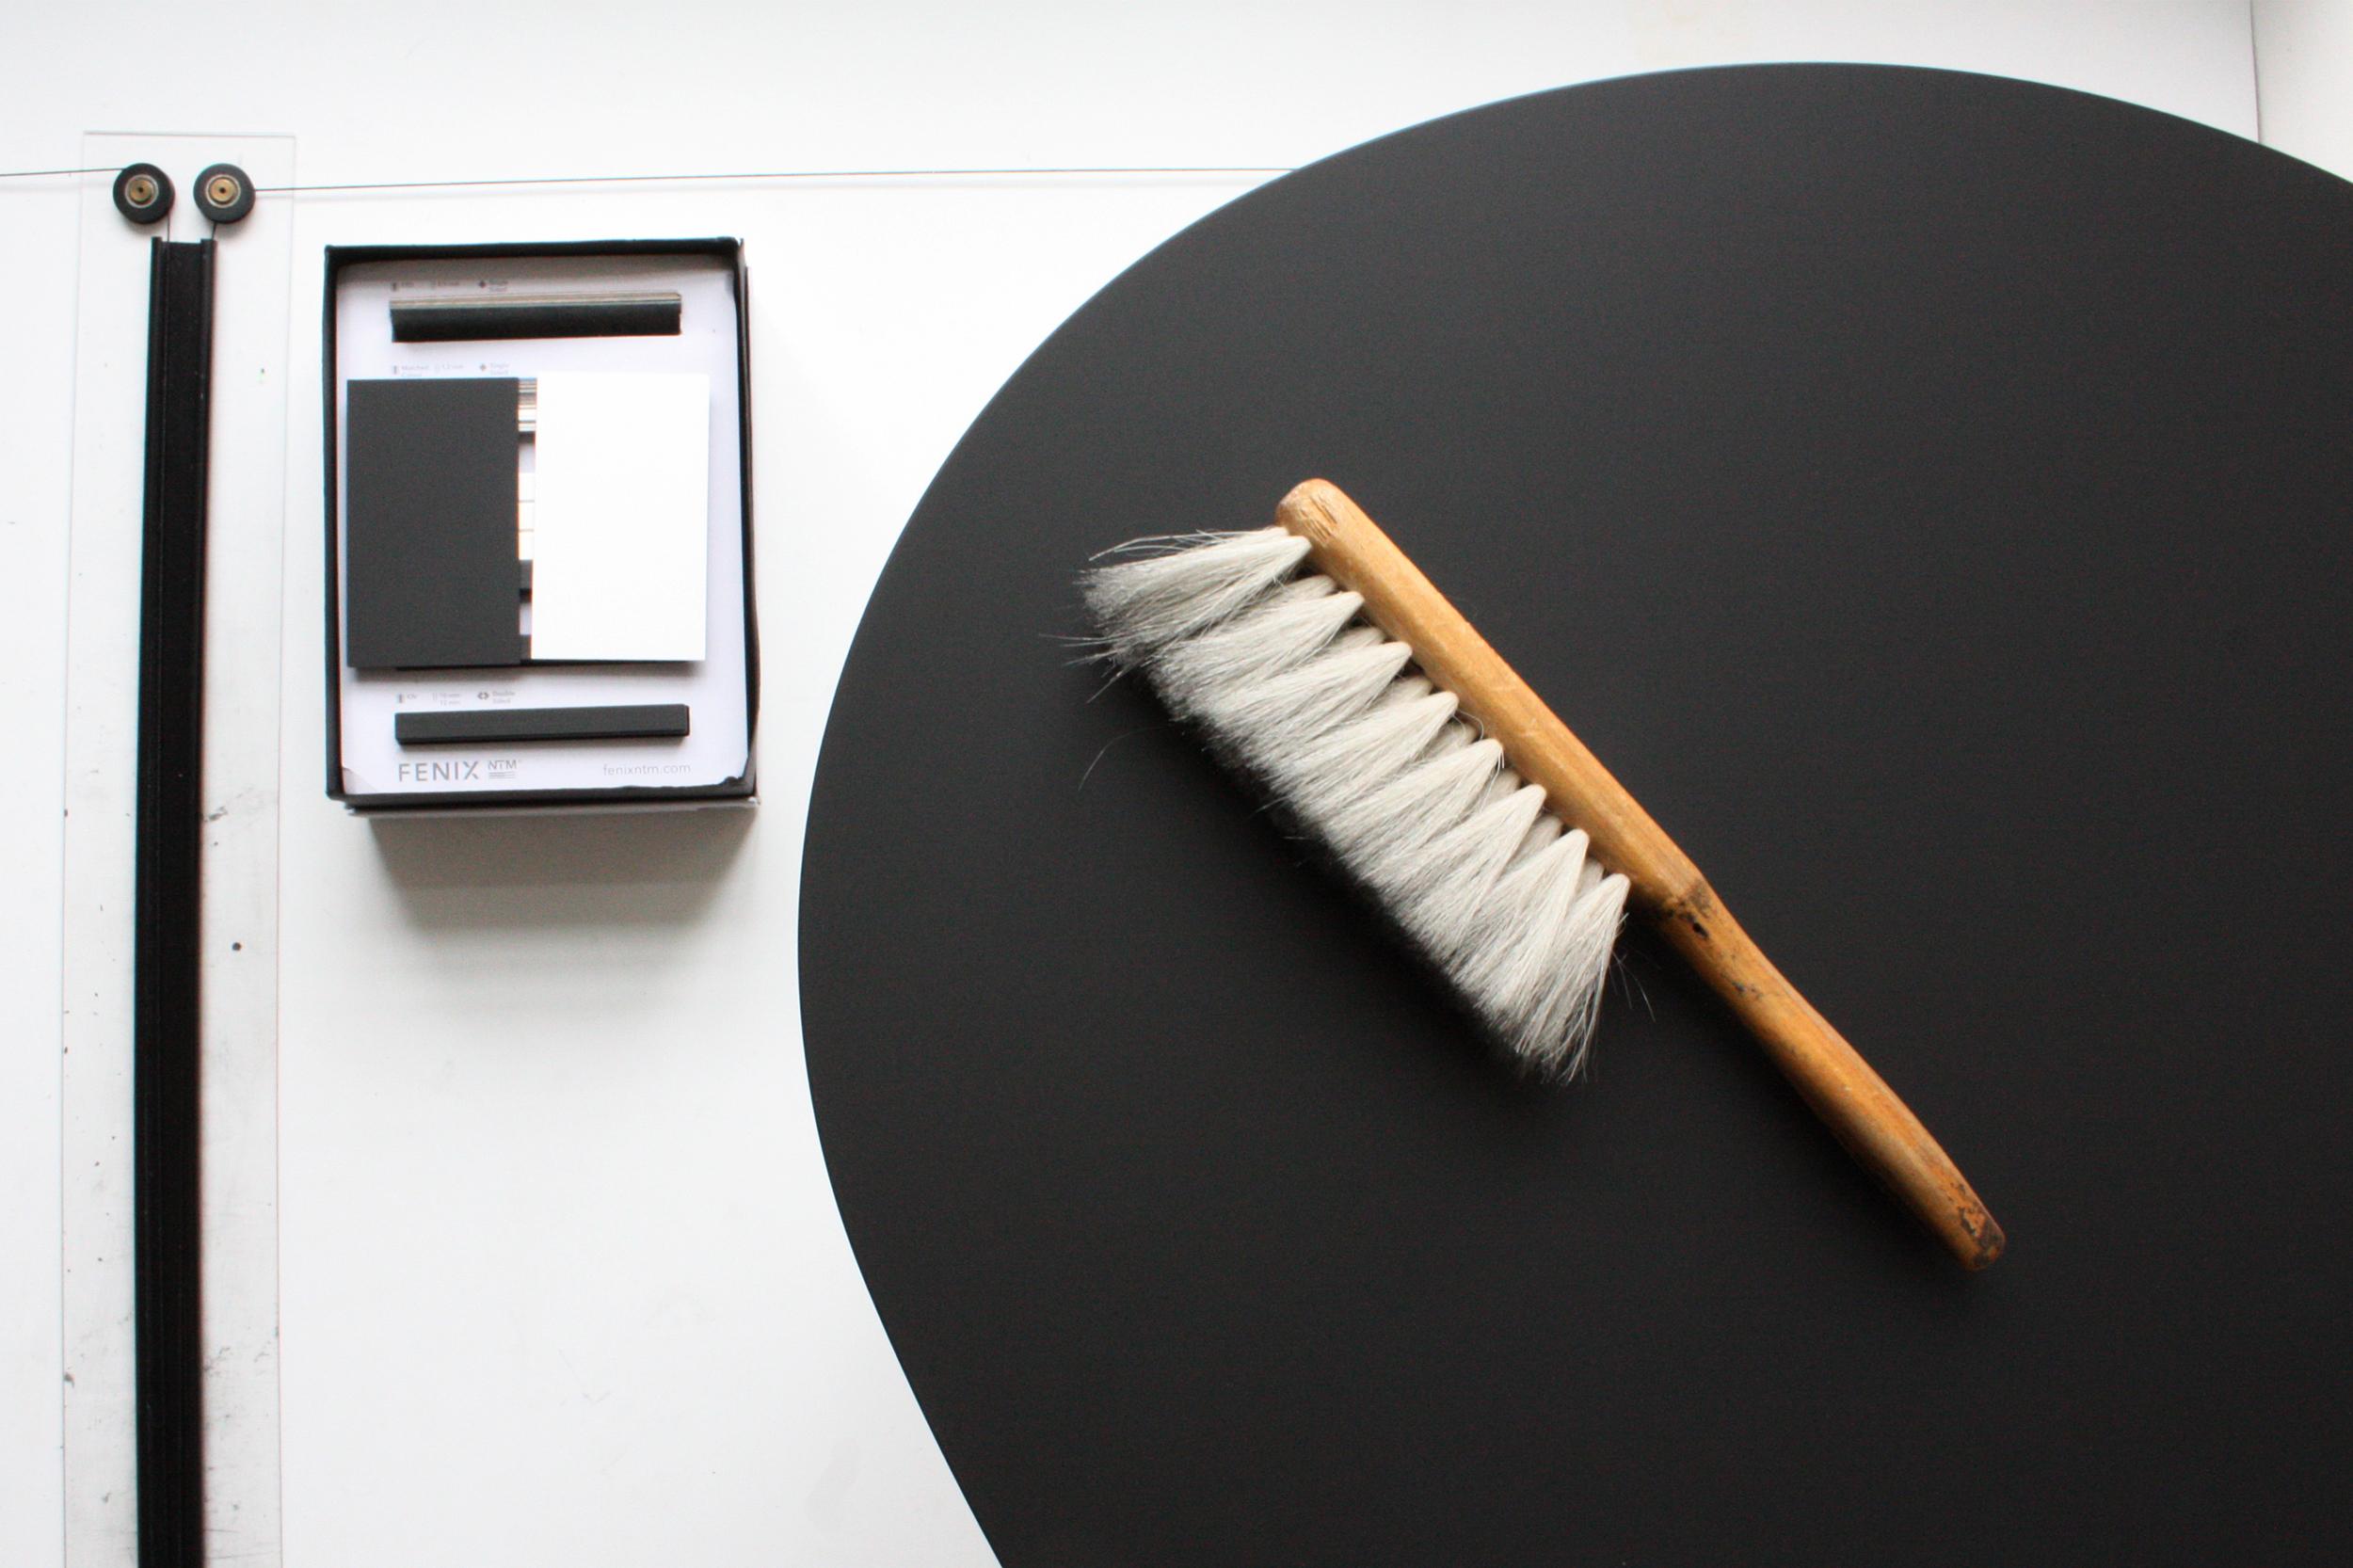 Morris coffee table model 1 in super matte black Nano laminate